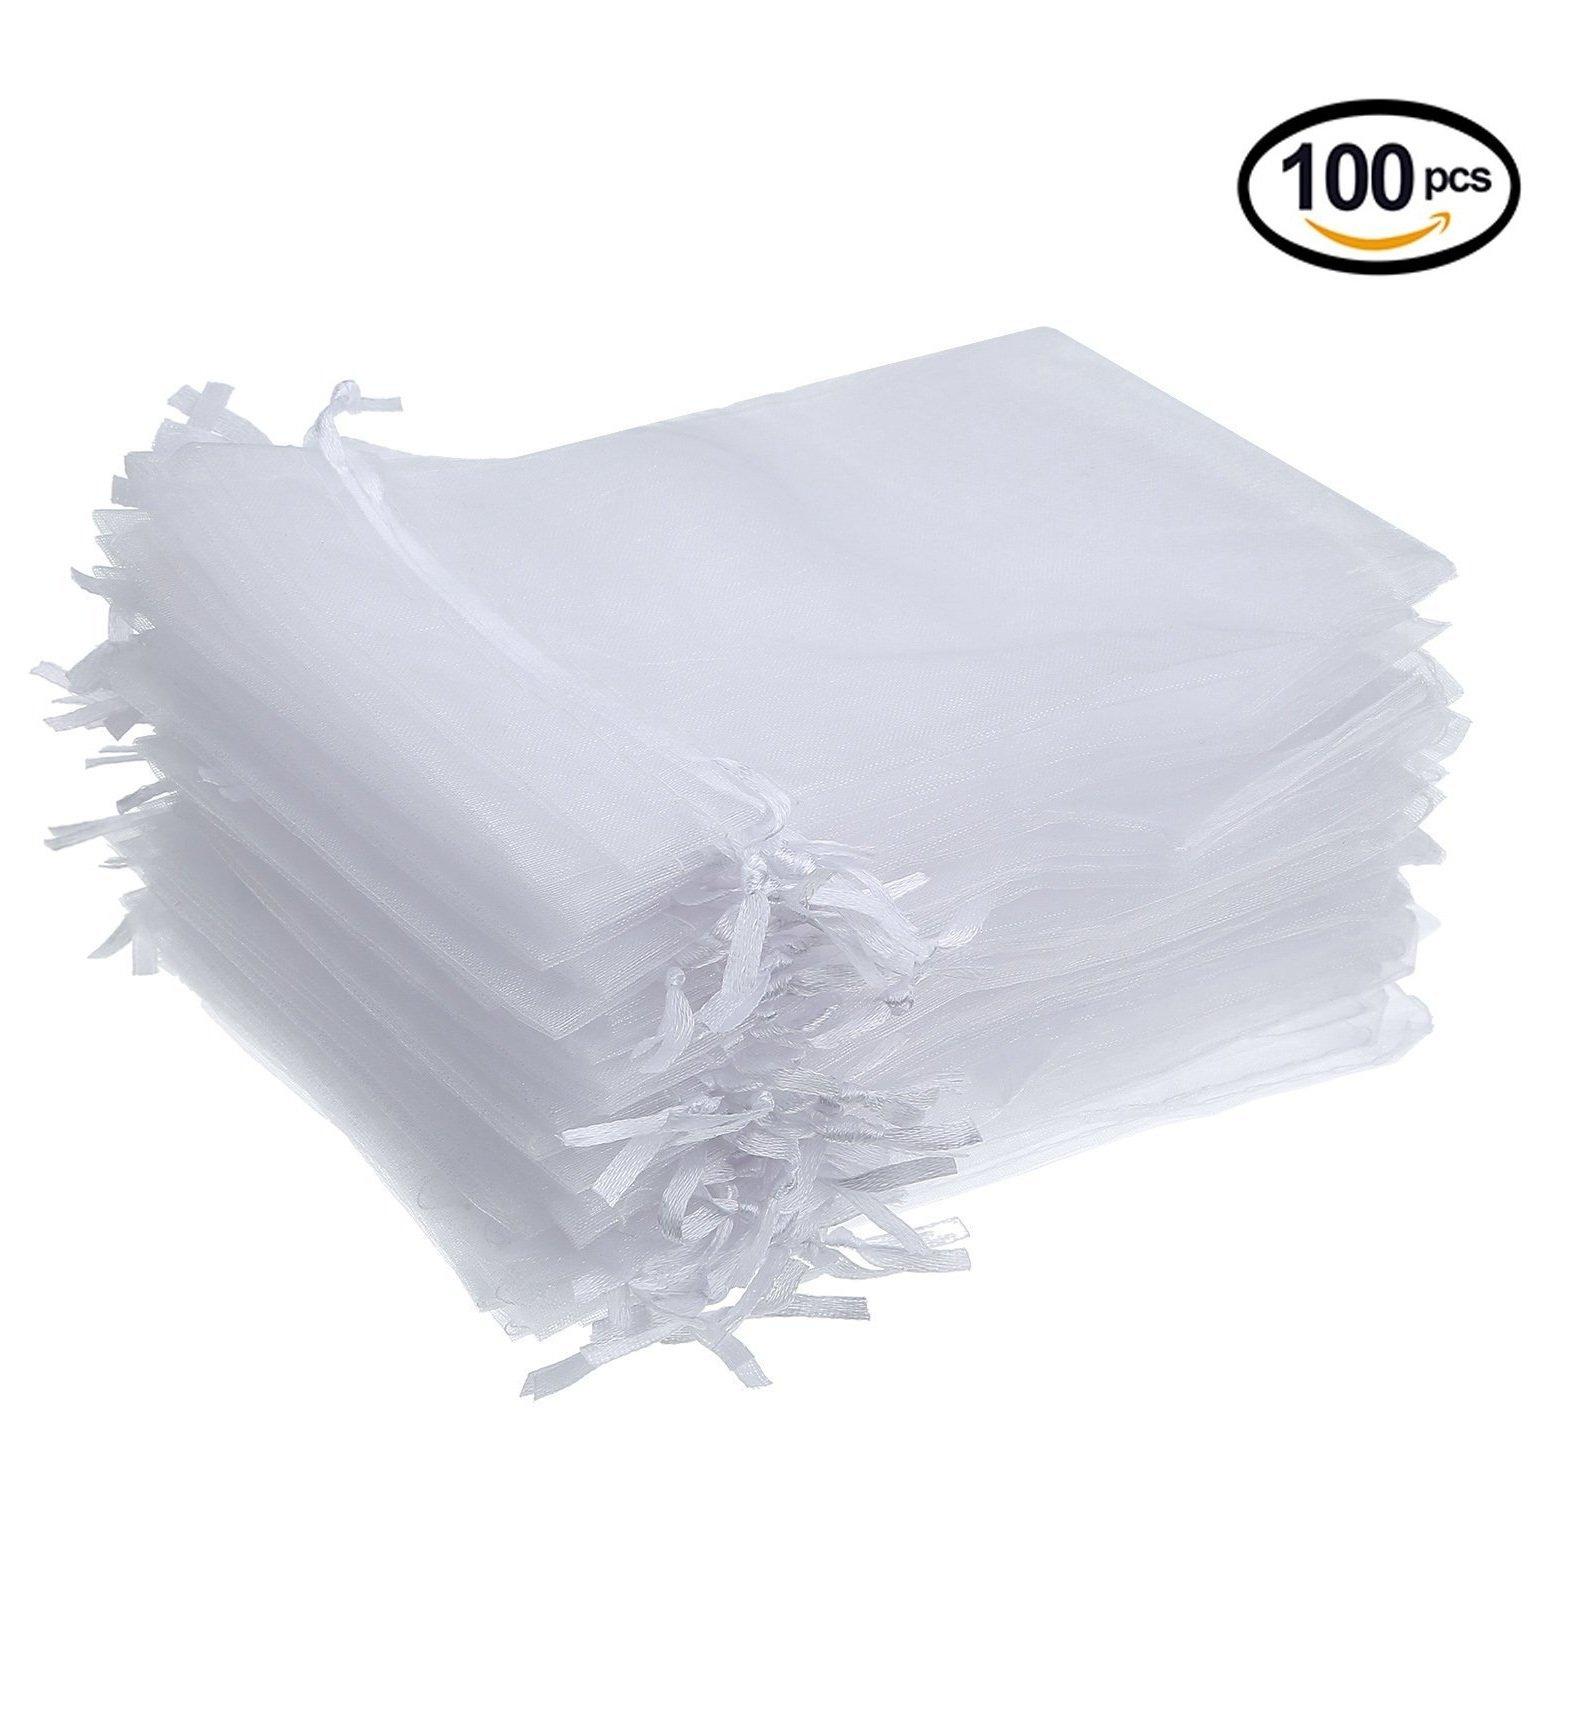 Amazon.com: Hengu 100Pcs 5x7 Inches White Sheer Drawstring Organza ...